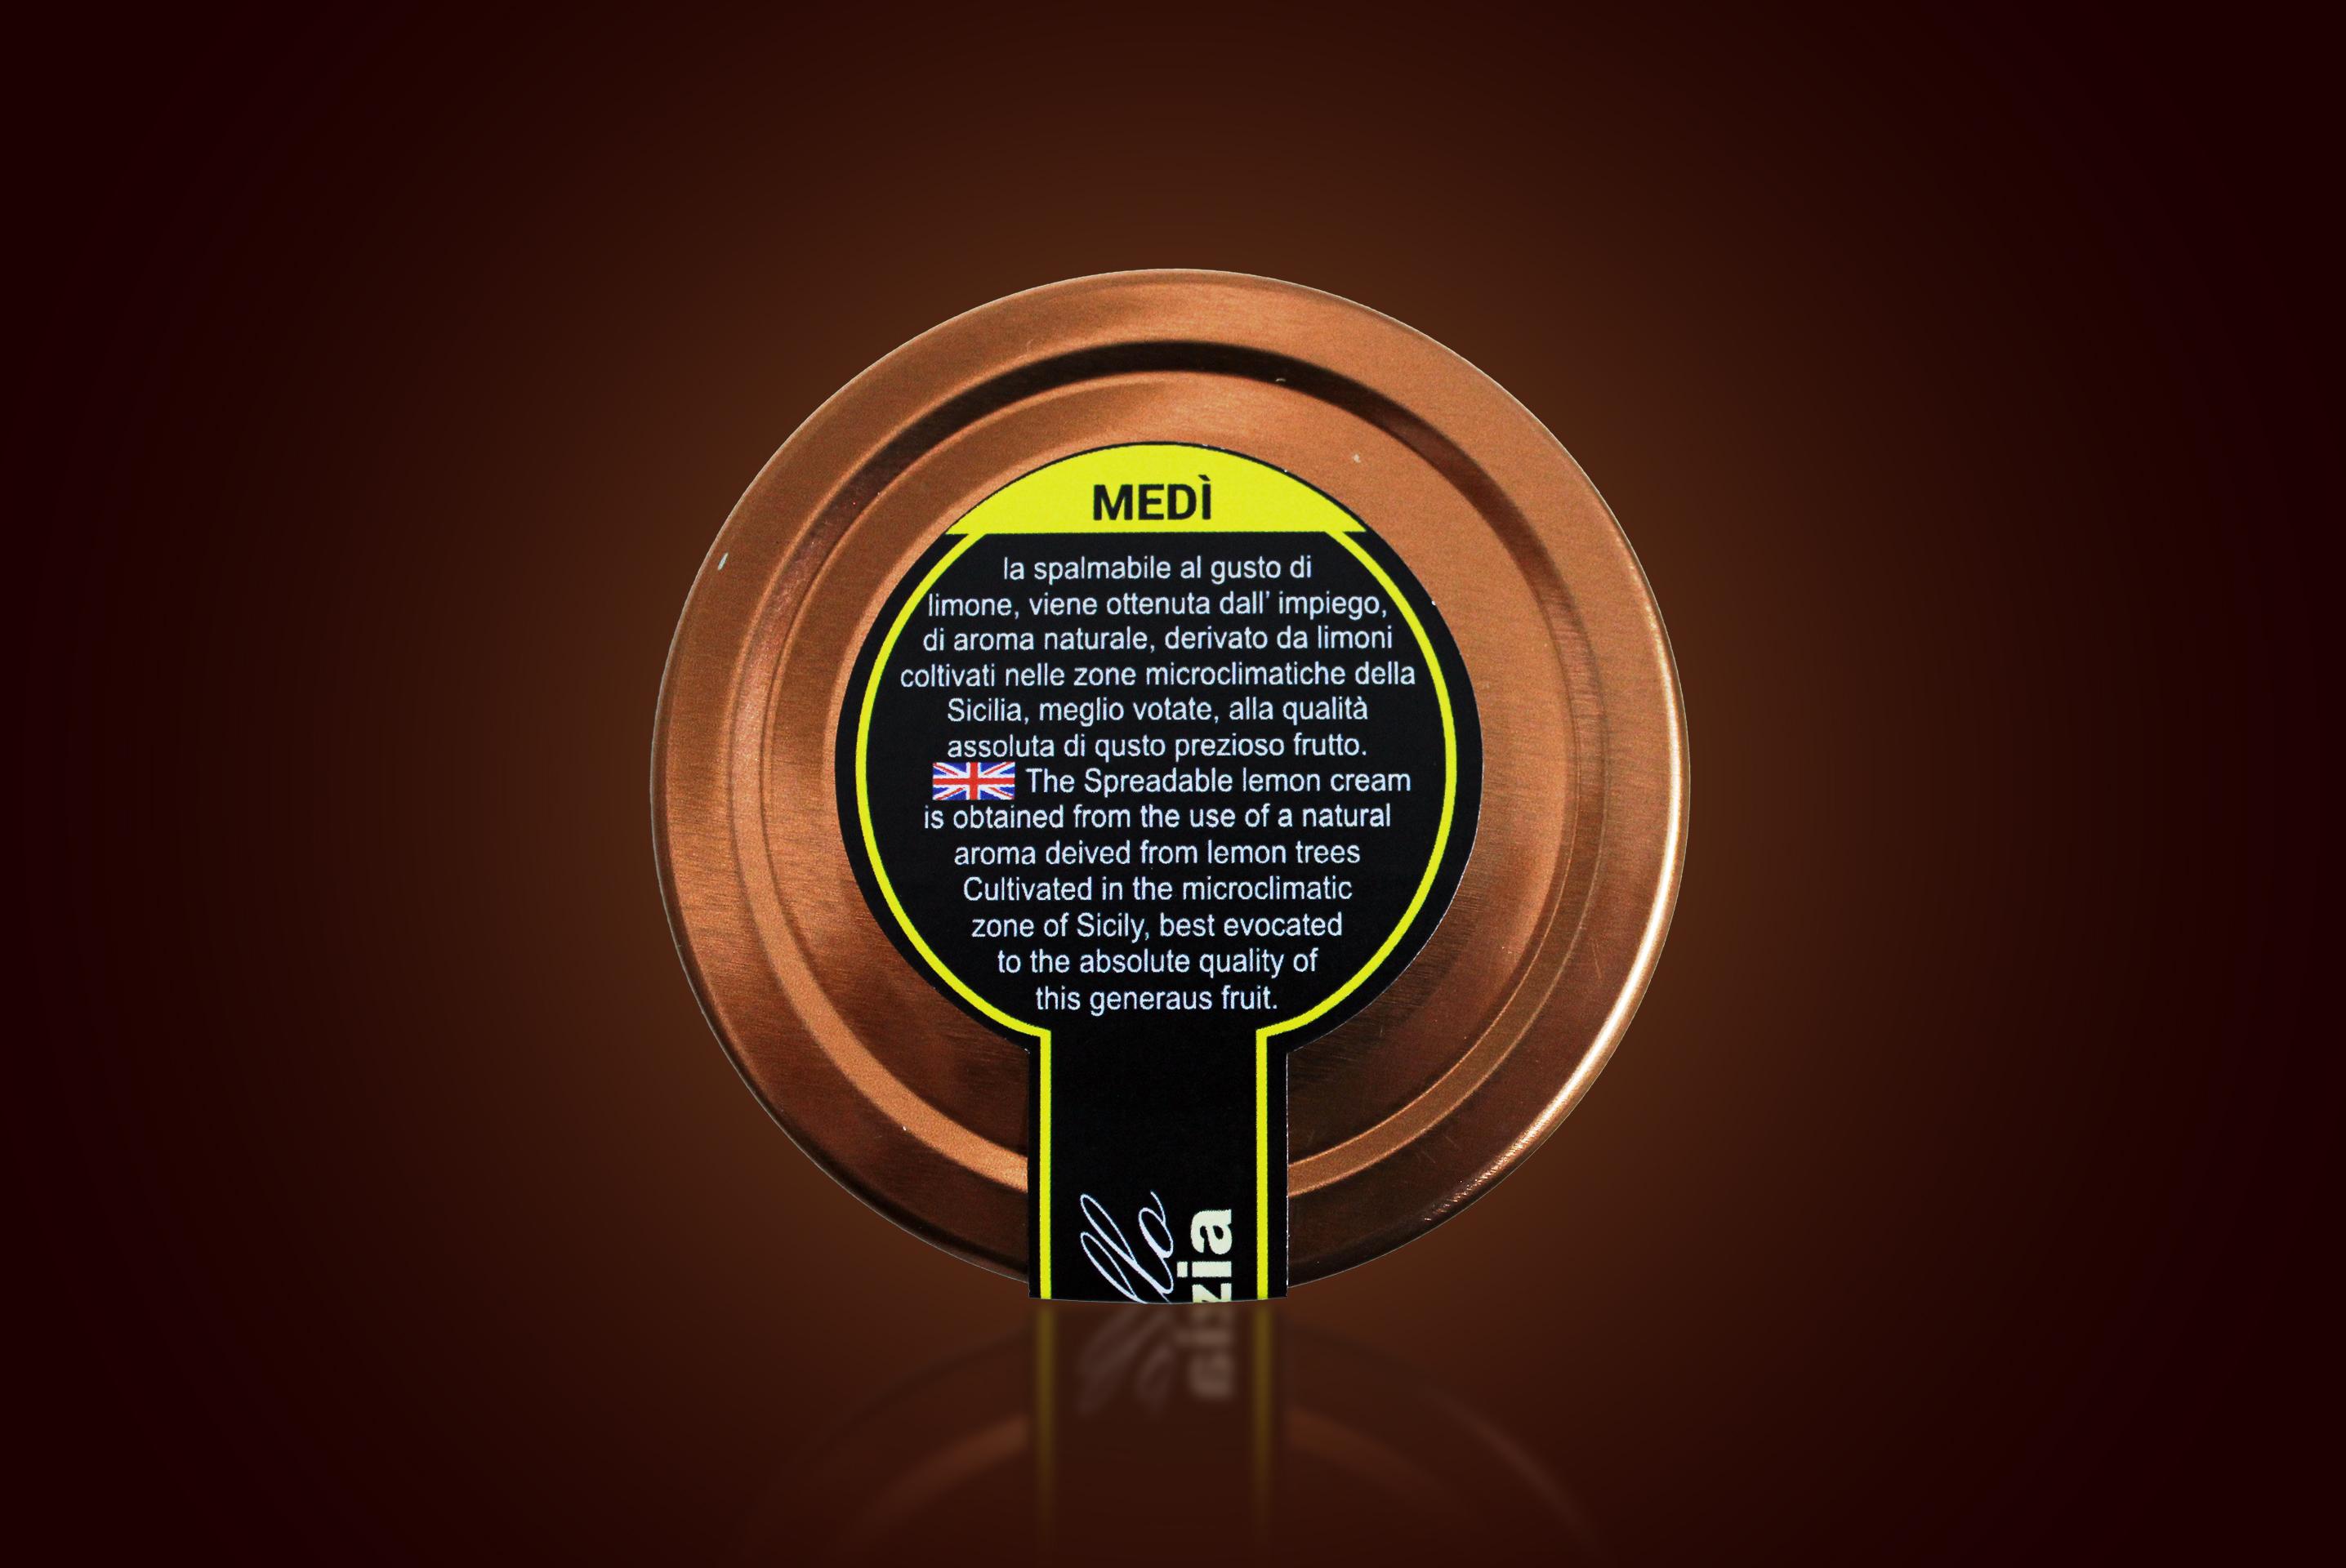 Crema-Medì-3